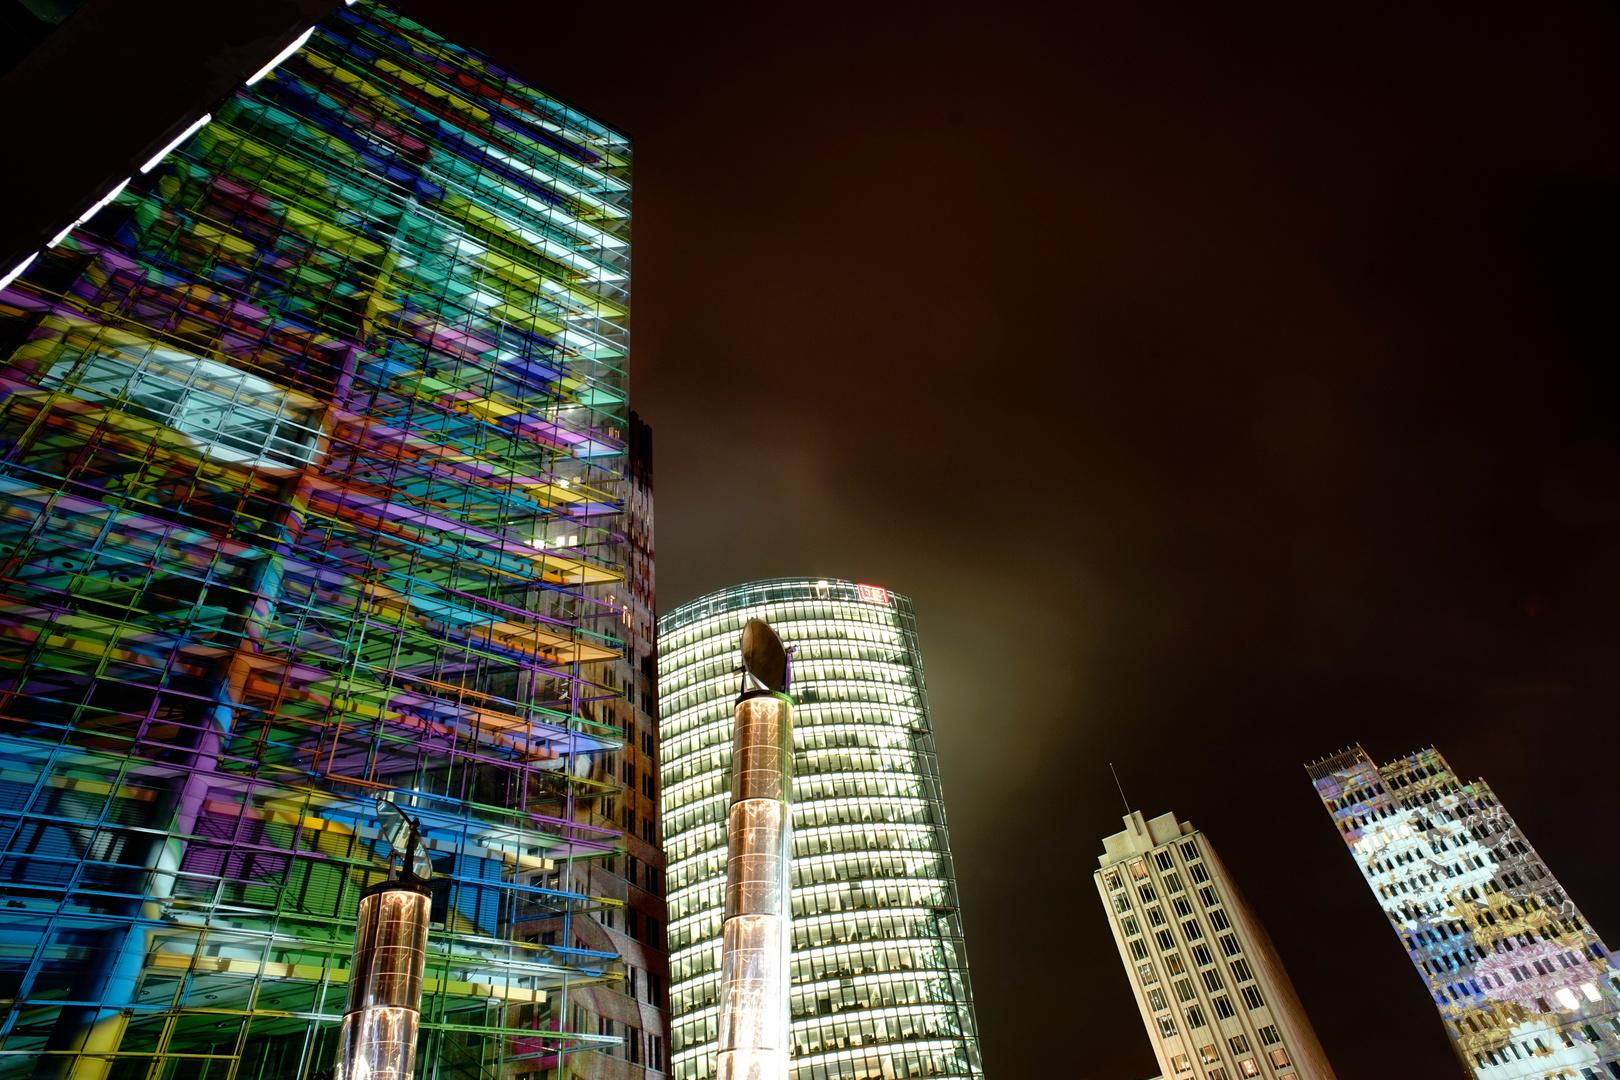 Illumination Potsdamer Platz